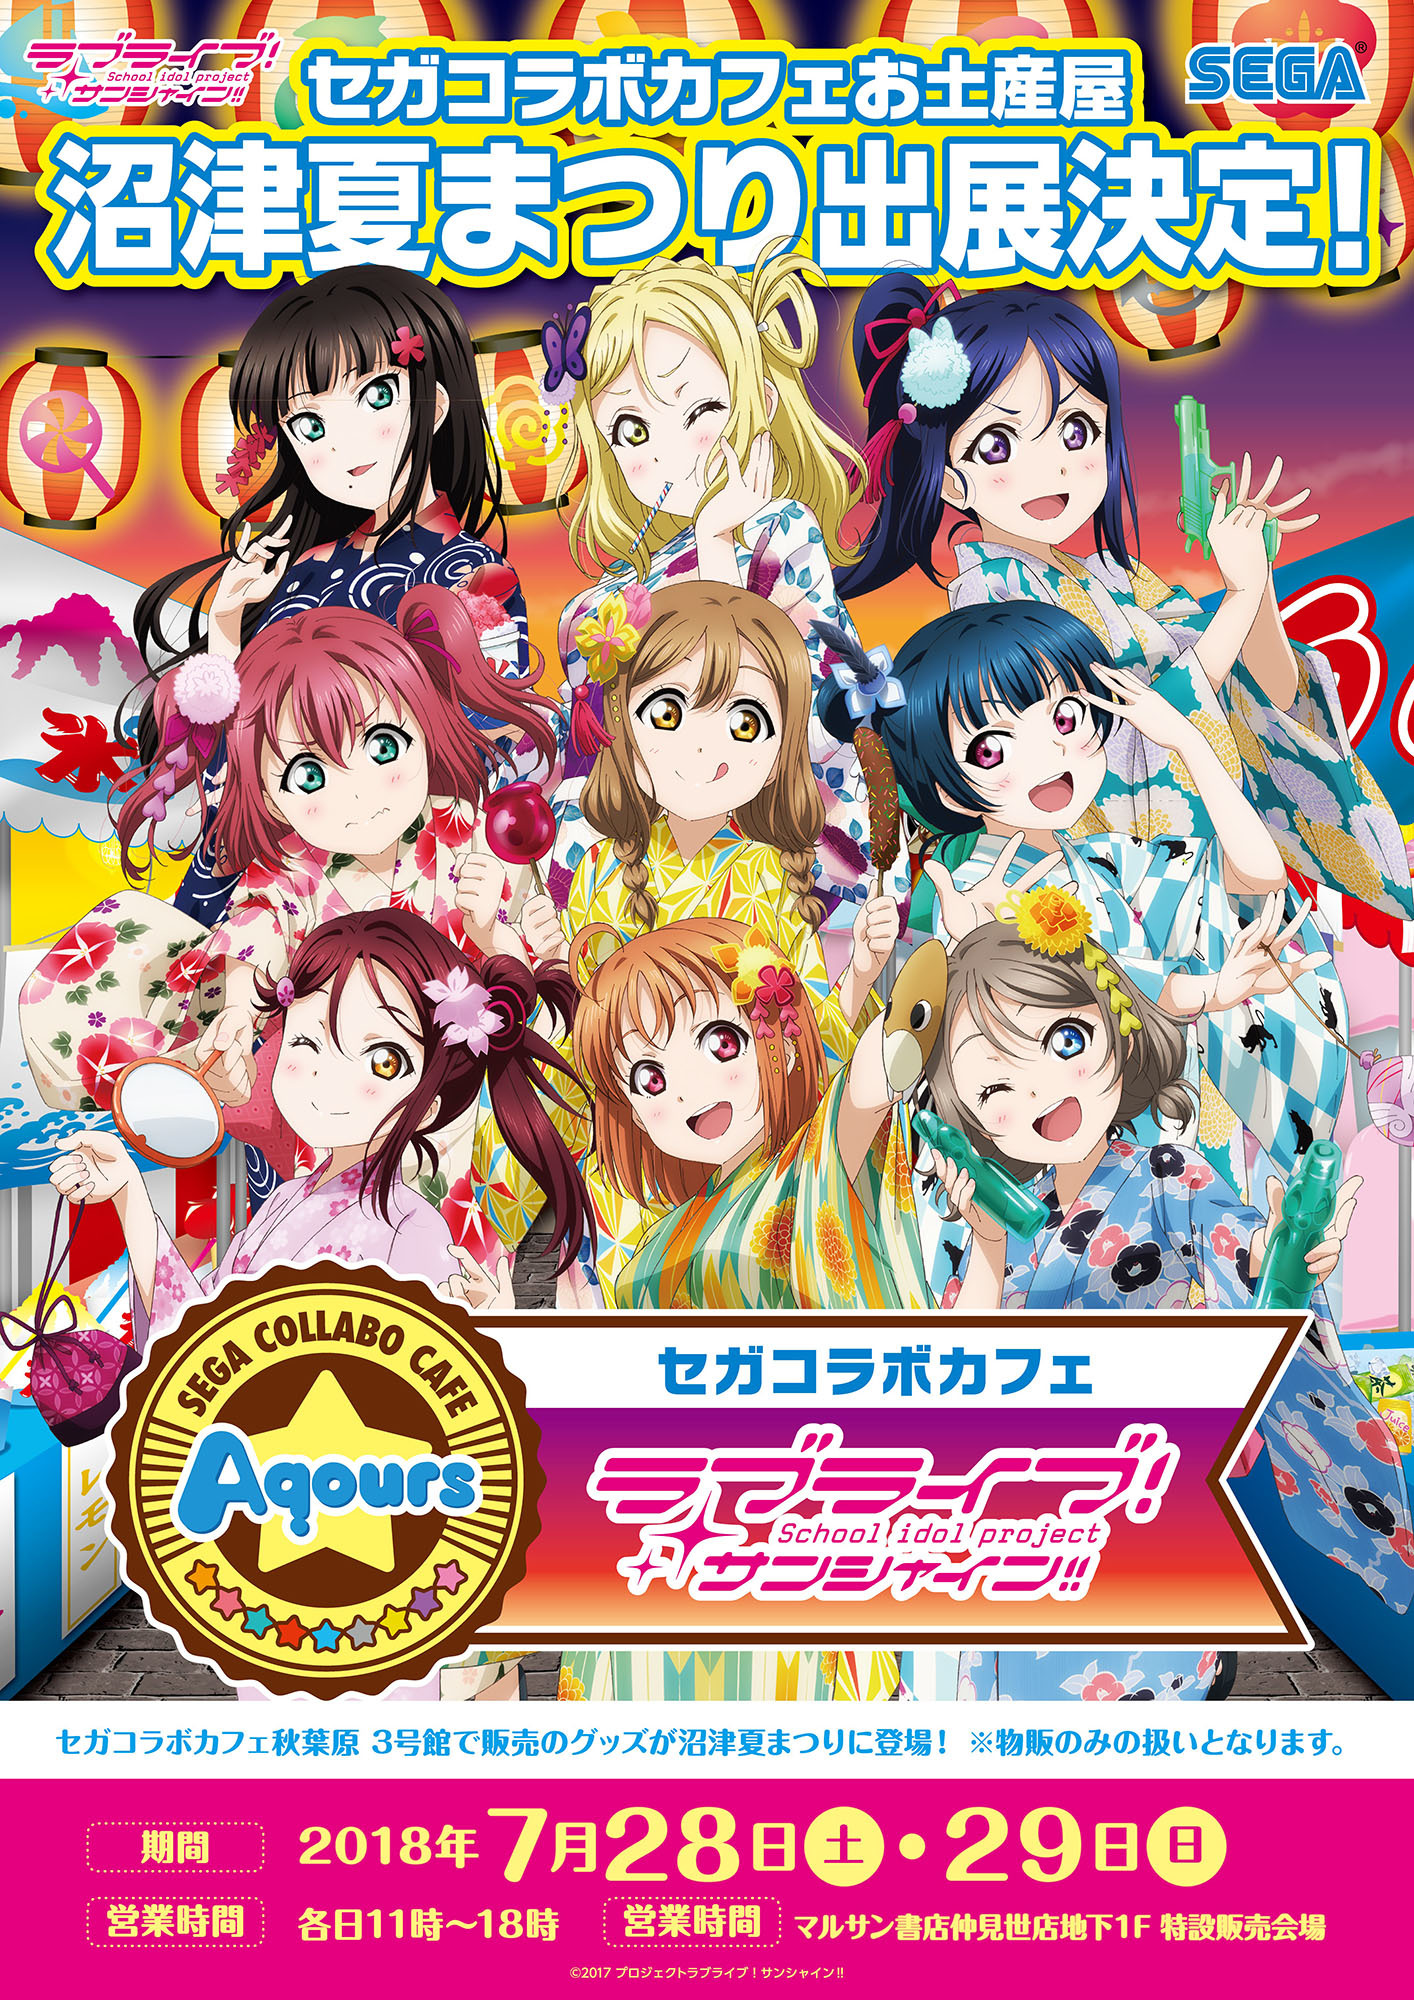 (C)2017 プロジェクトラブライブ!サンシャイン!! (C)SEGA